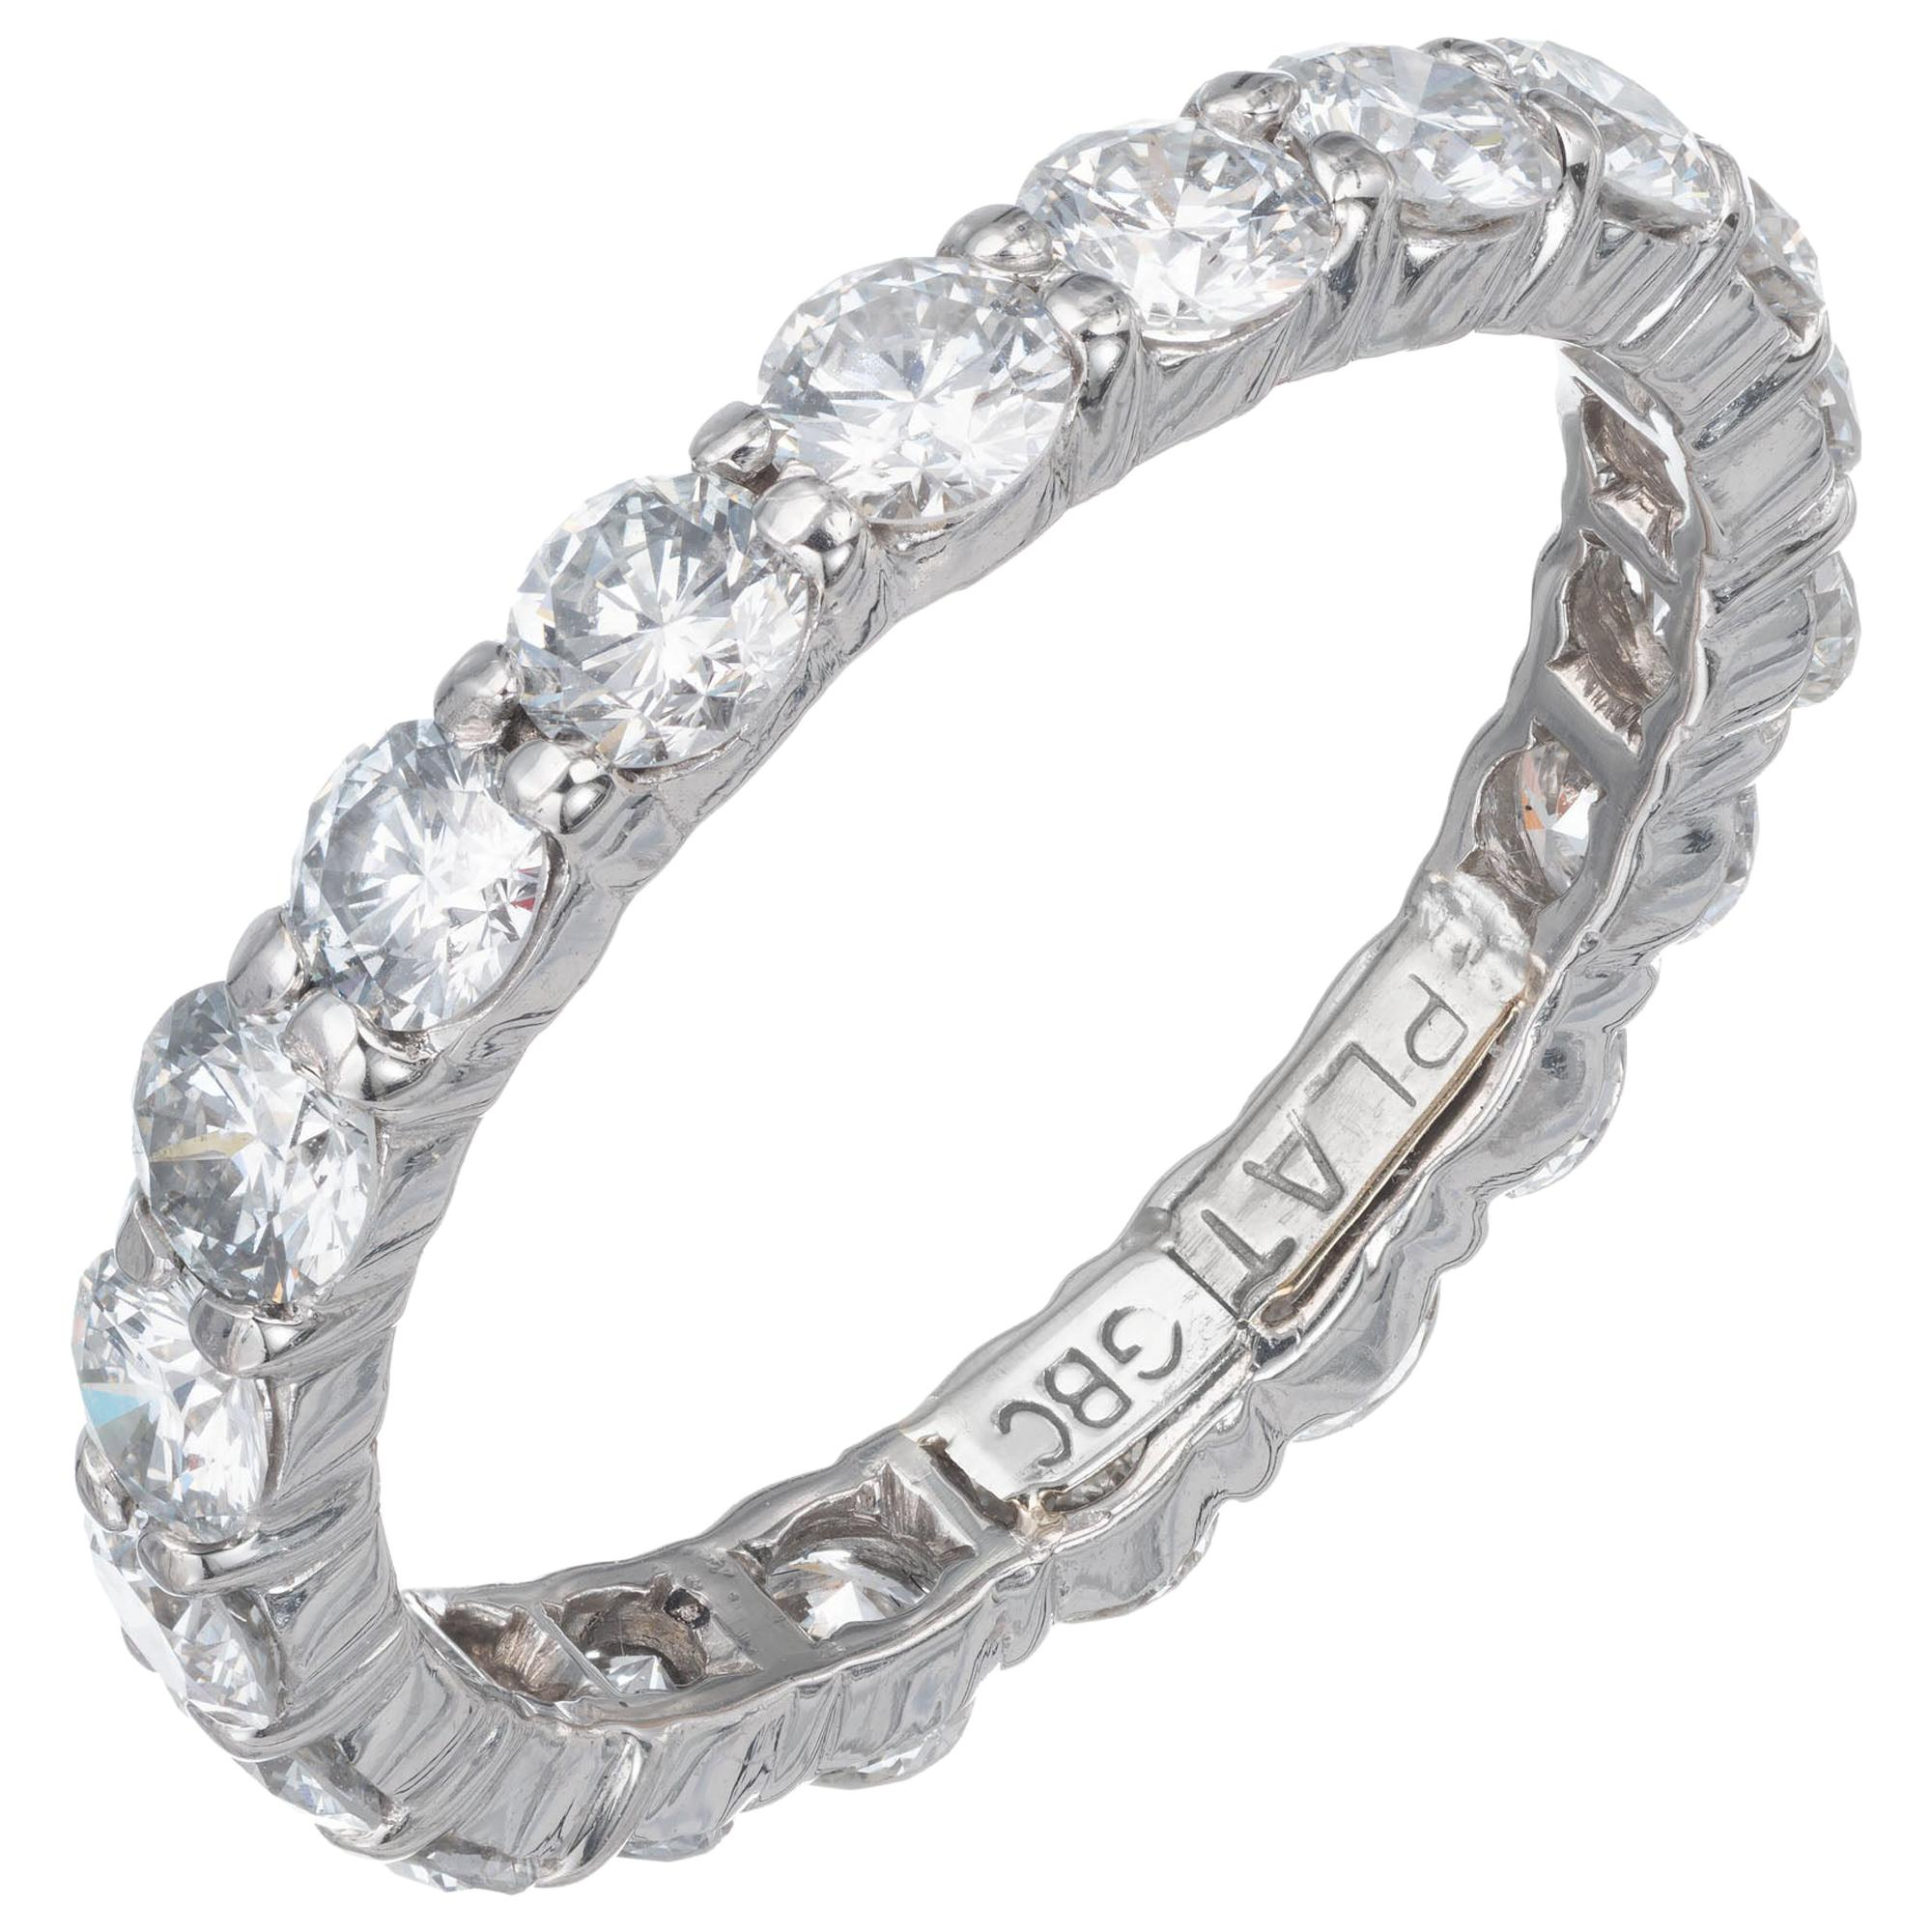 1.76 Carat Round Diamond Platinum Eternity Wedding Band Ring